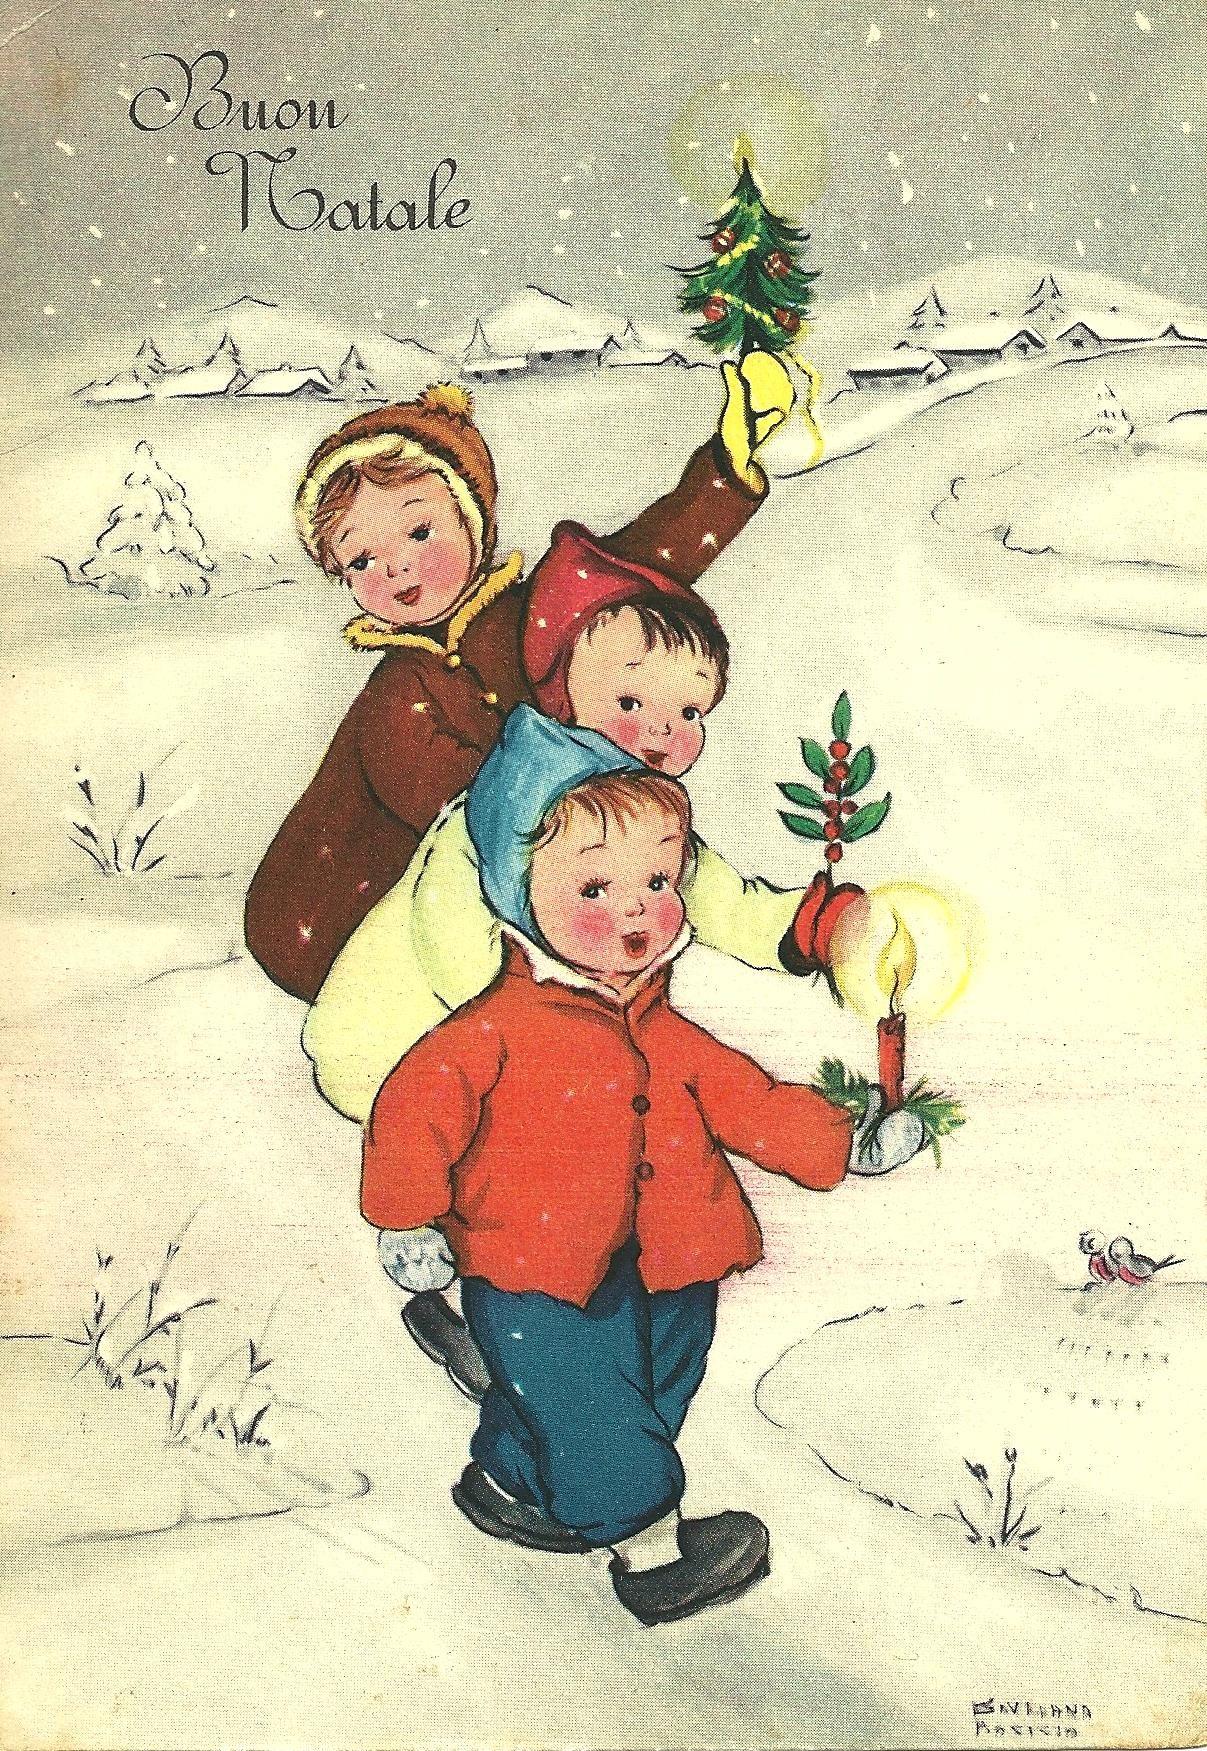 Vintage christmas card 1955 vintage pinterest vintage vintage christmas card 1955 kristyandbryce Images